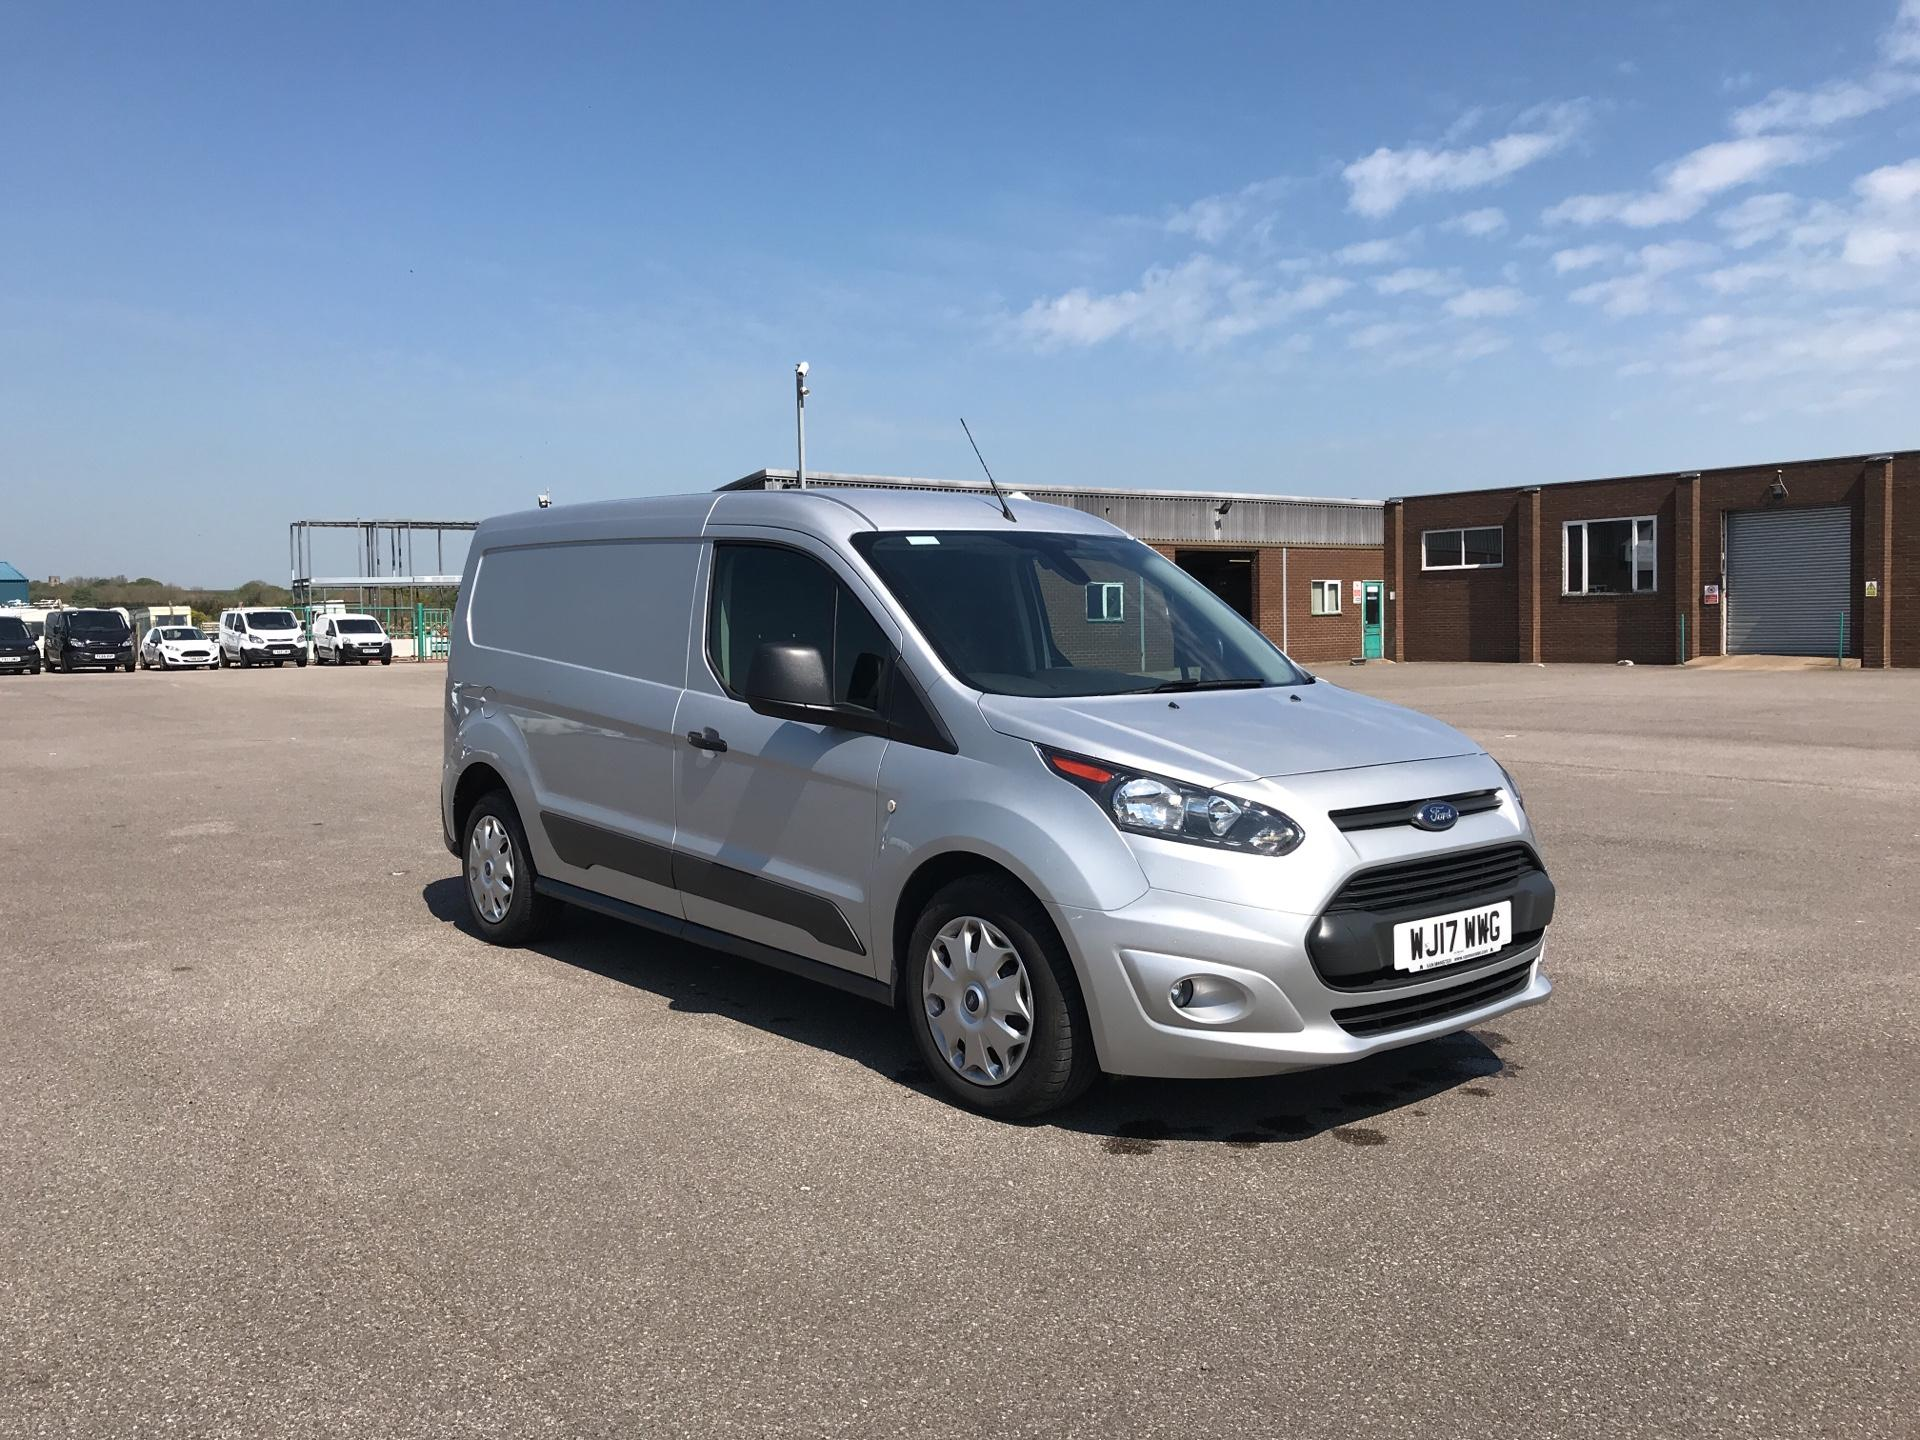 2017 Ford Transit Connect 240 L2 DIESEL 1.5 TDCI 100PS VAN EURO 6 (WJ17WWG)